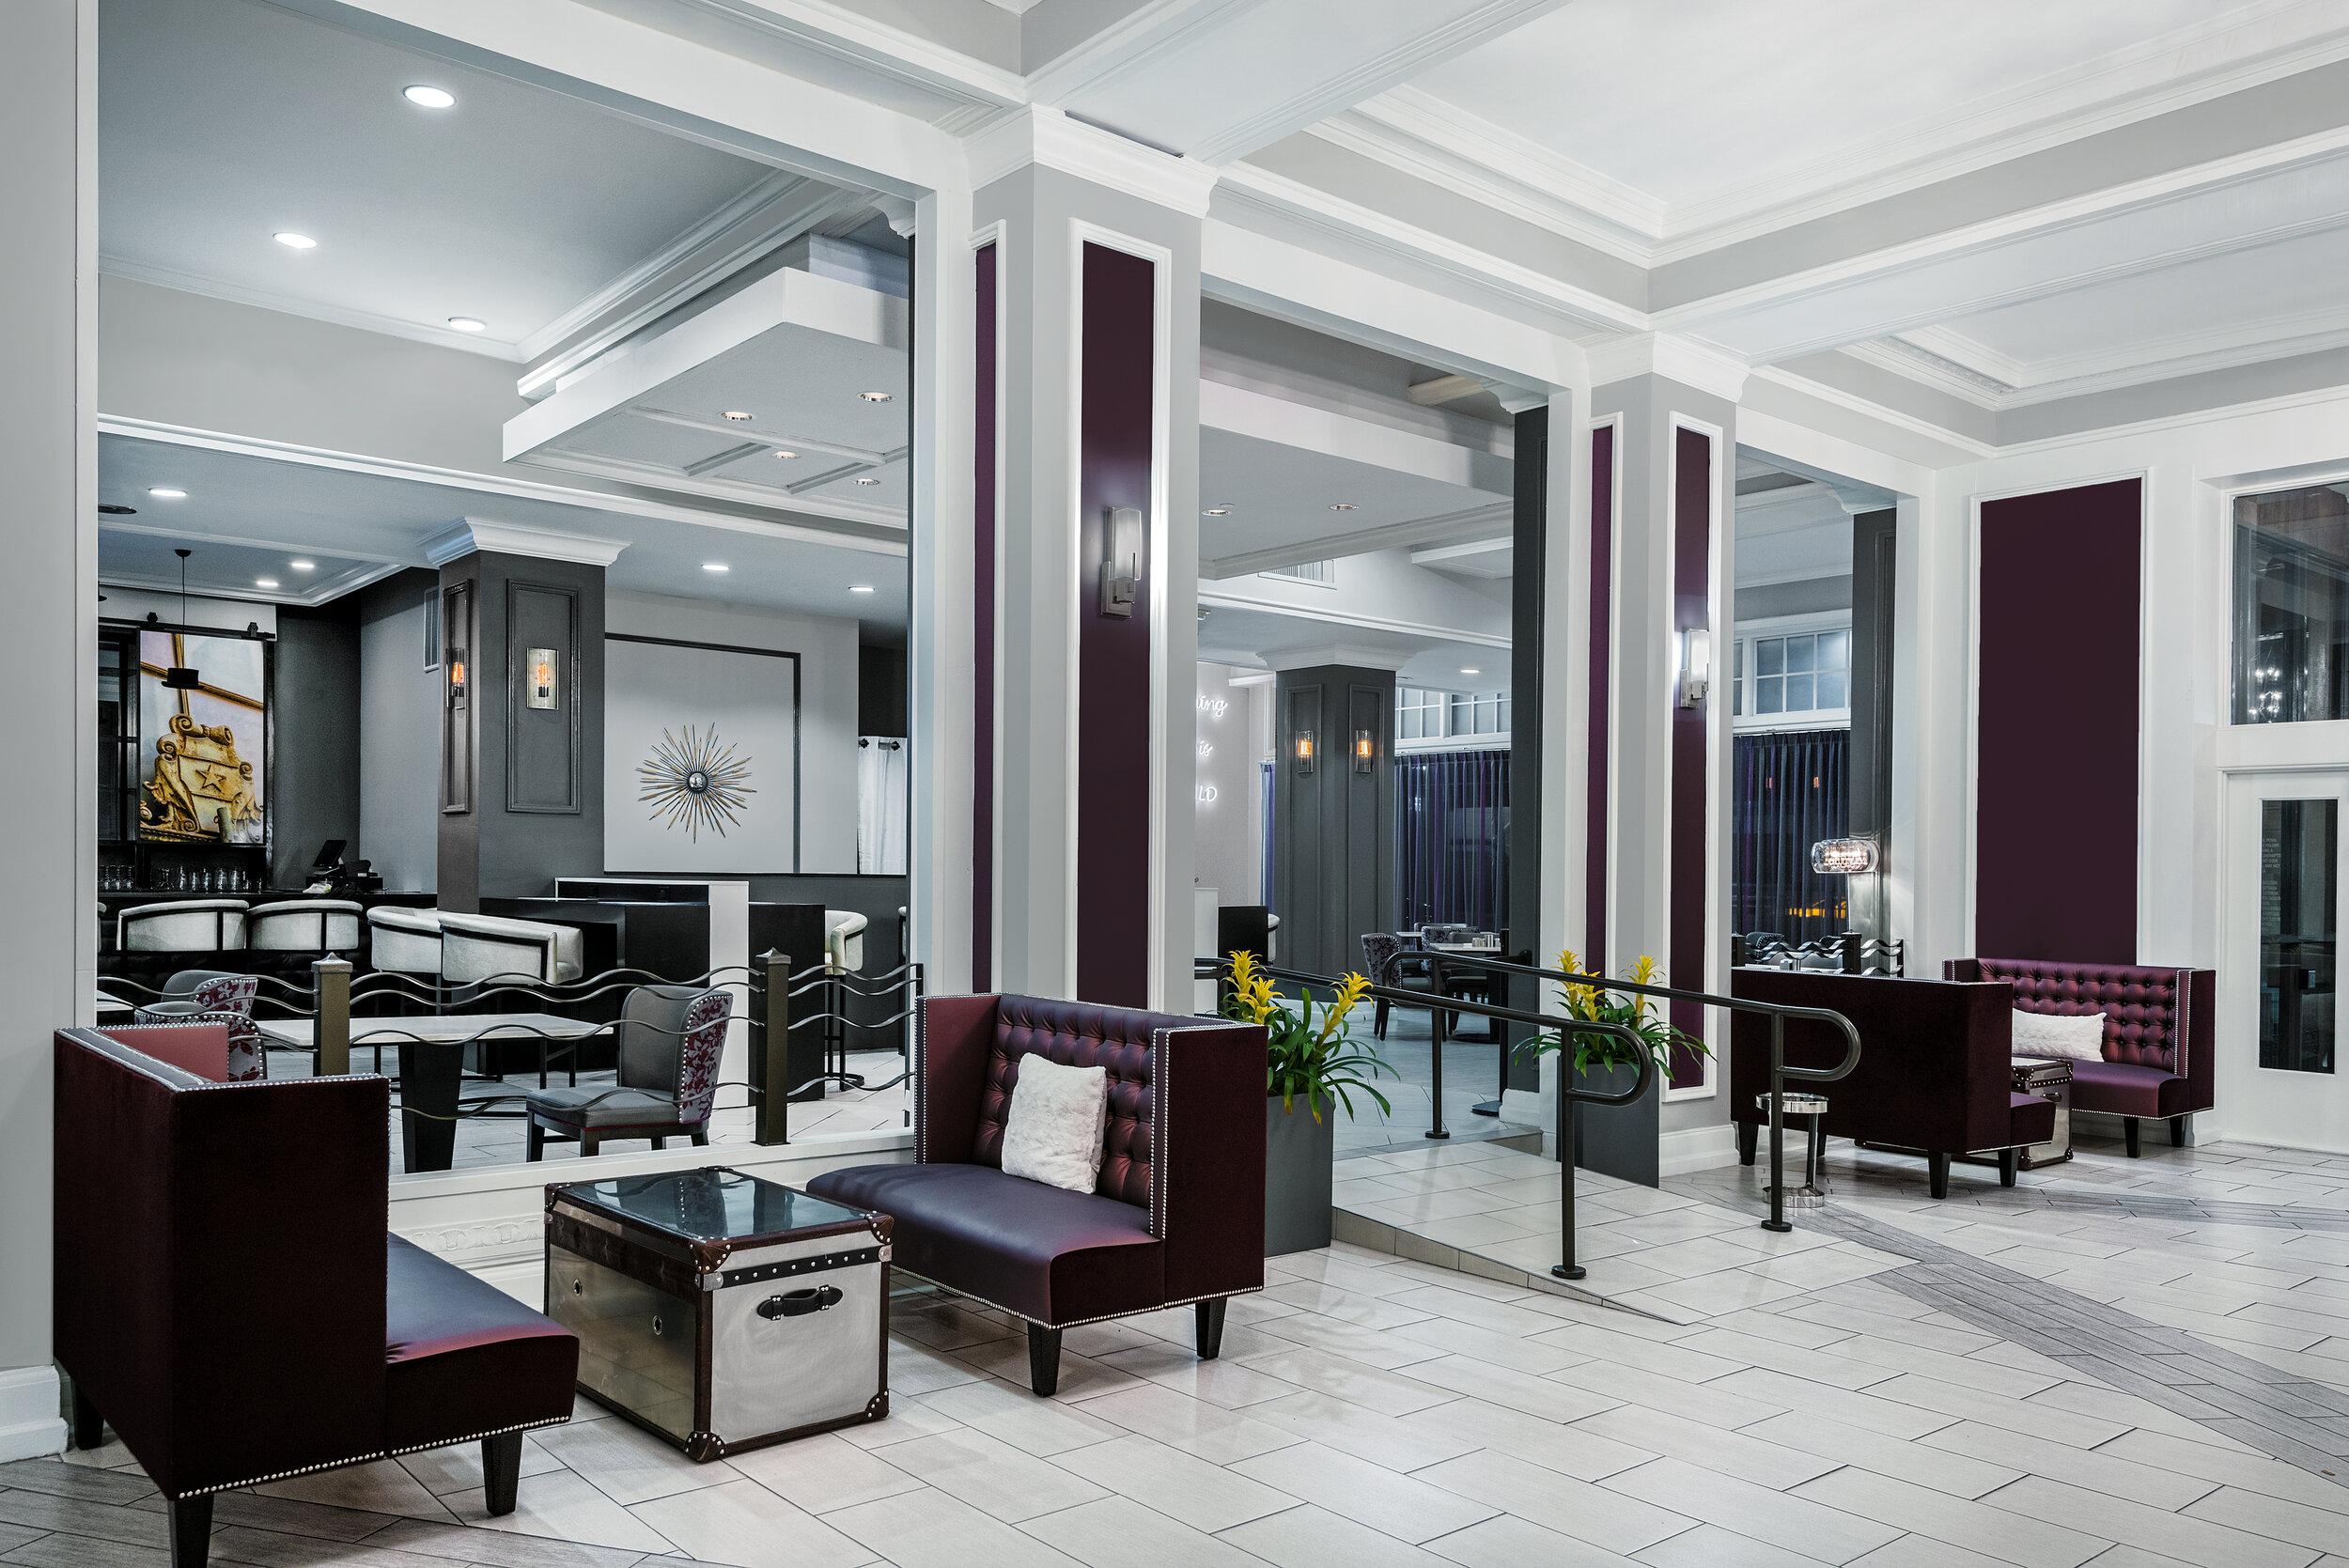 dalar-hotel-indigo-dallas-downtown-lobby-seating (1).jpg